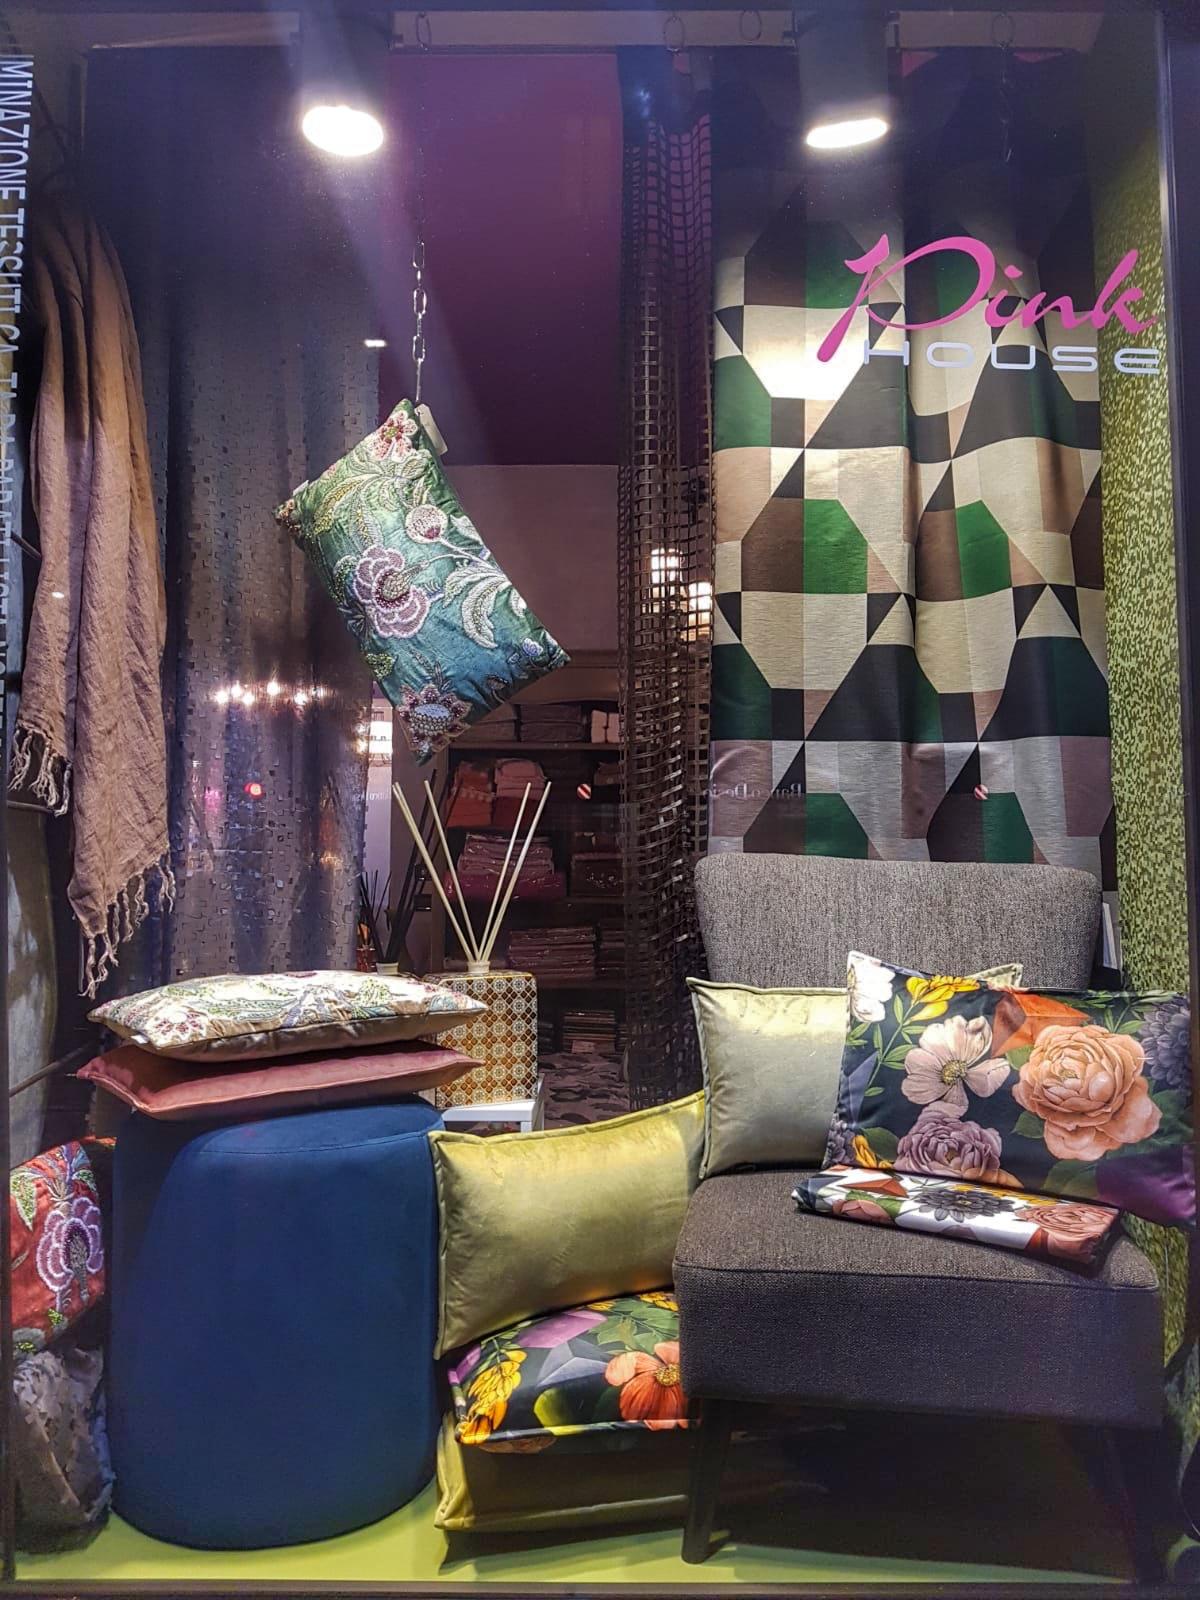 sara-rombola-pink-house-arredatrice-interior-designer-torino-talentieventi-5